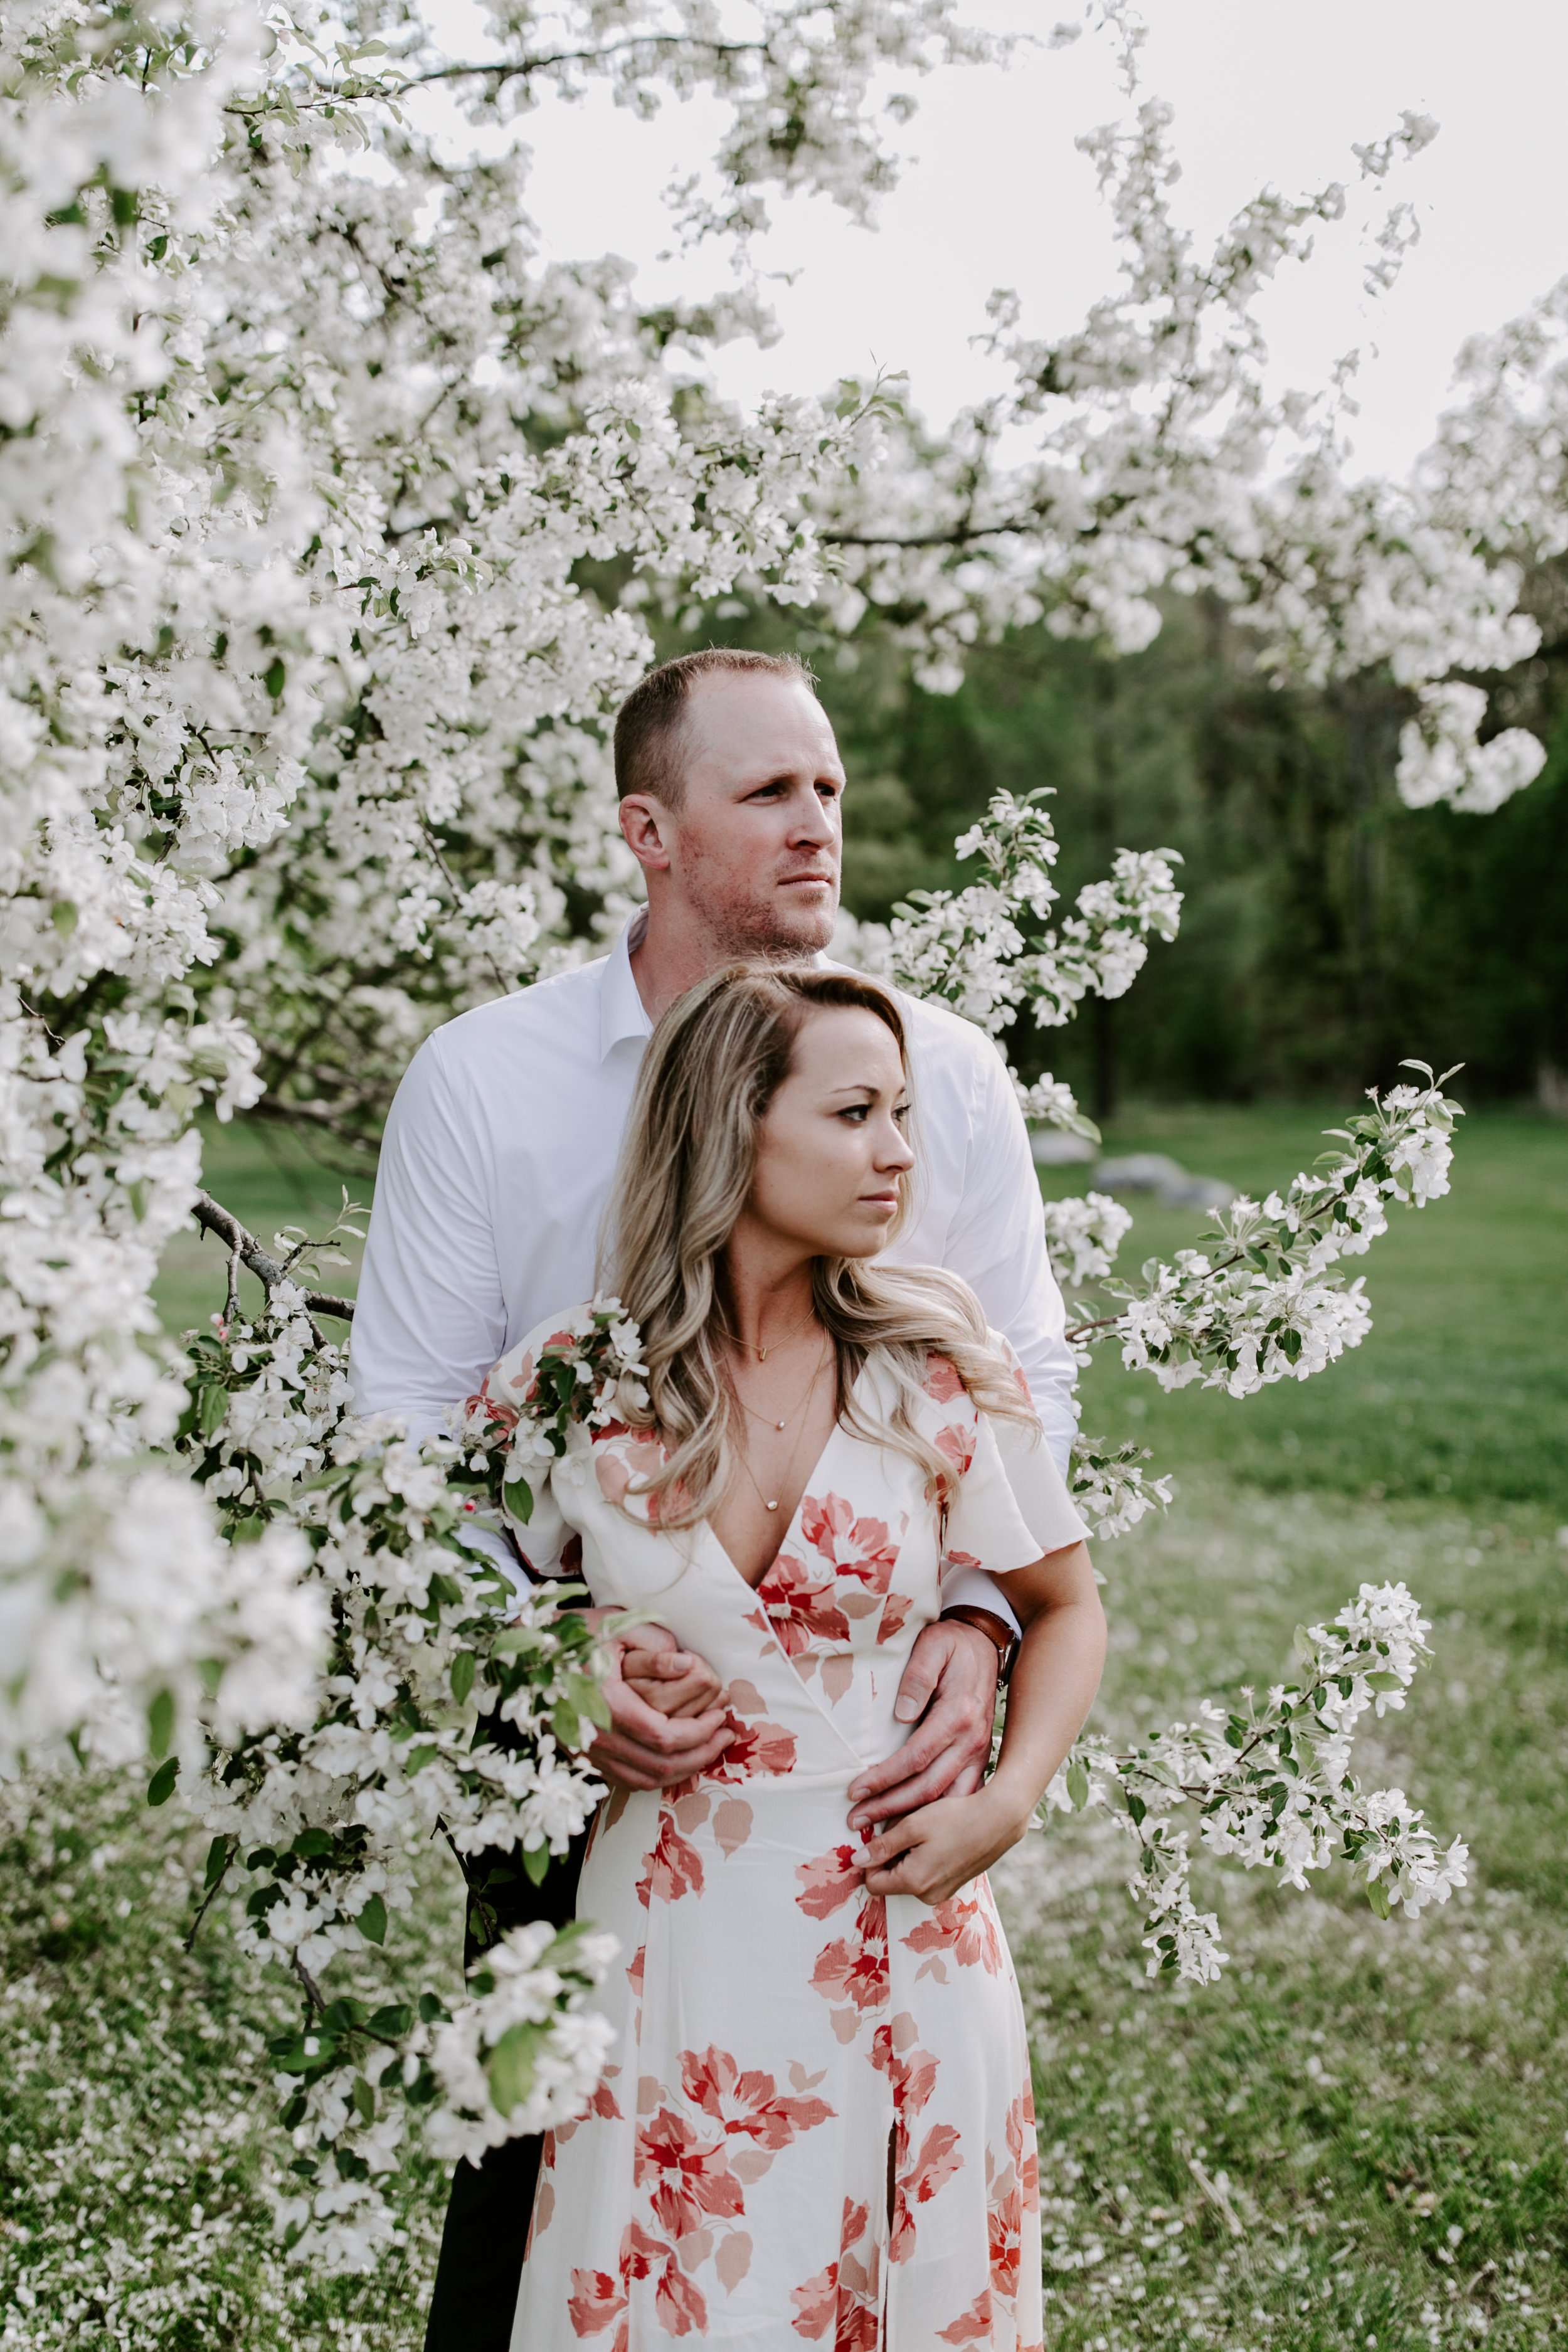 gracetphotography-wedding-photographer-adventure-bride-engagement-midwest-28.jpg